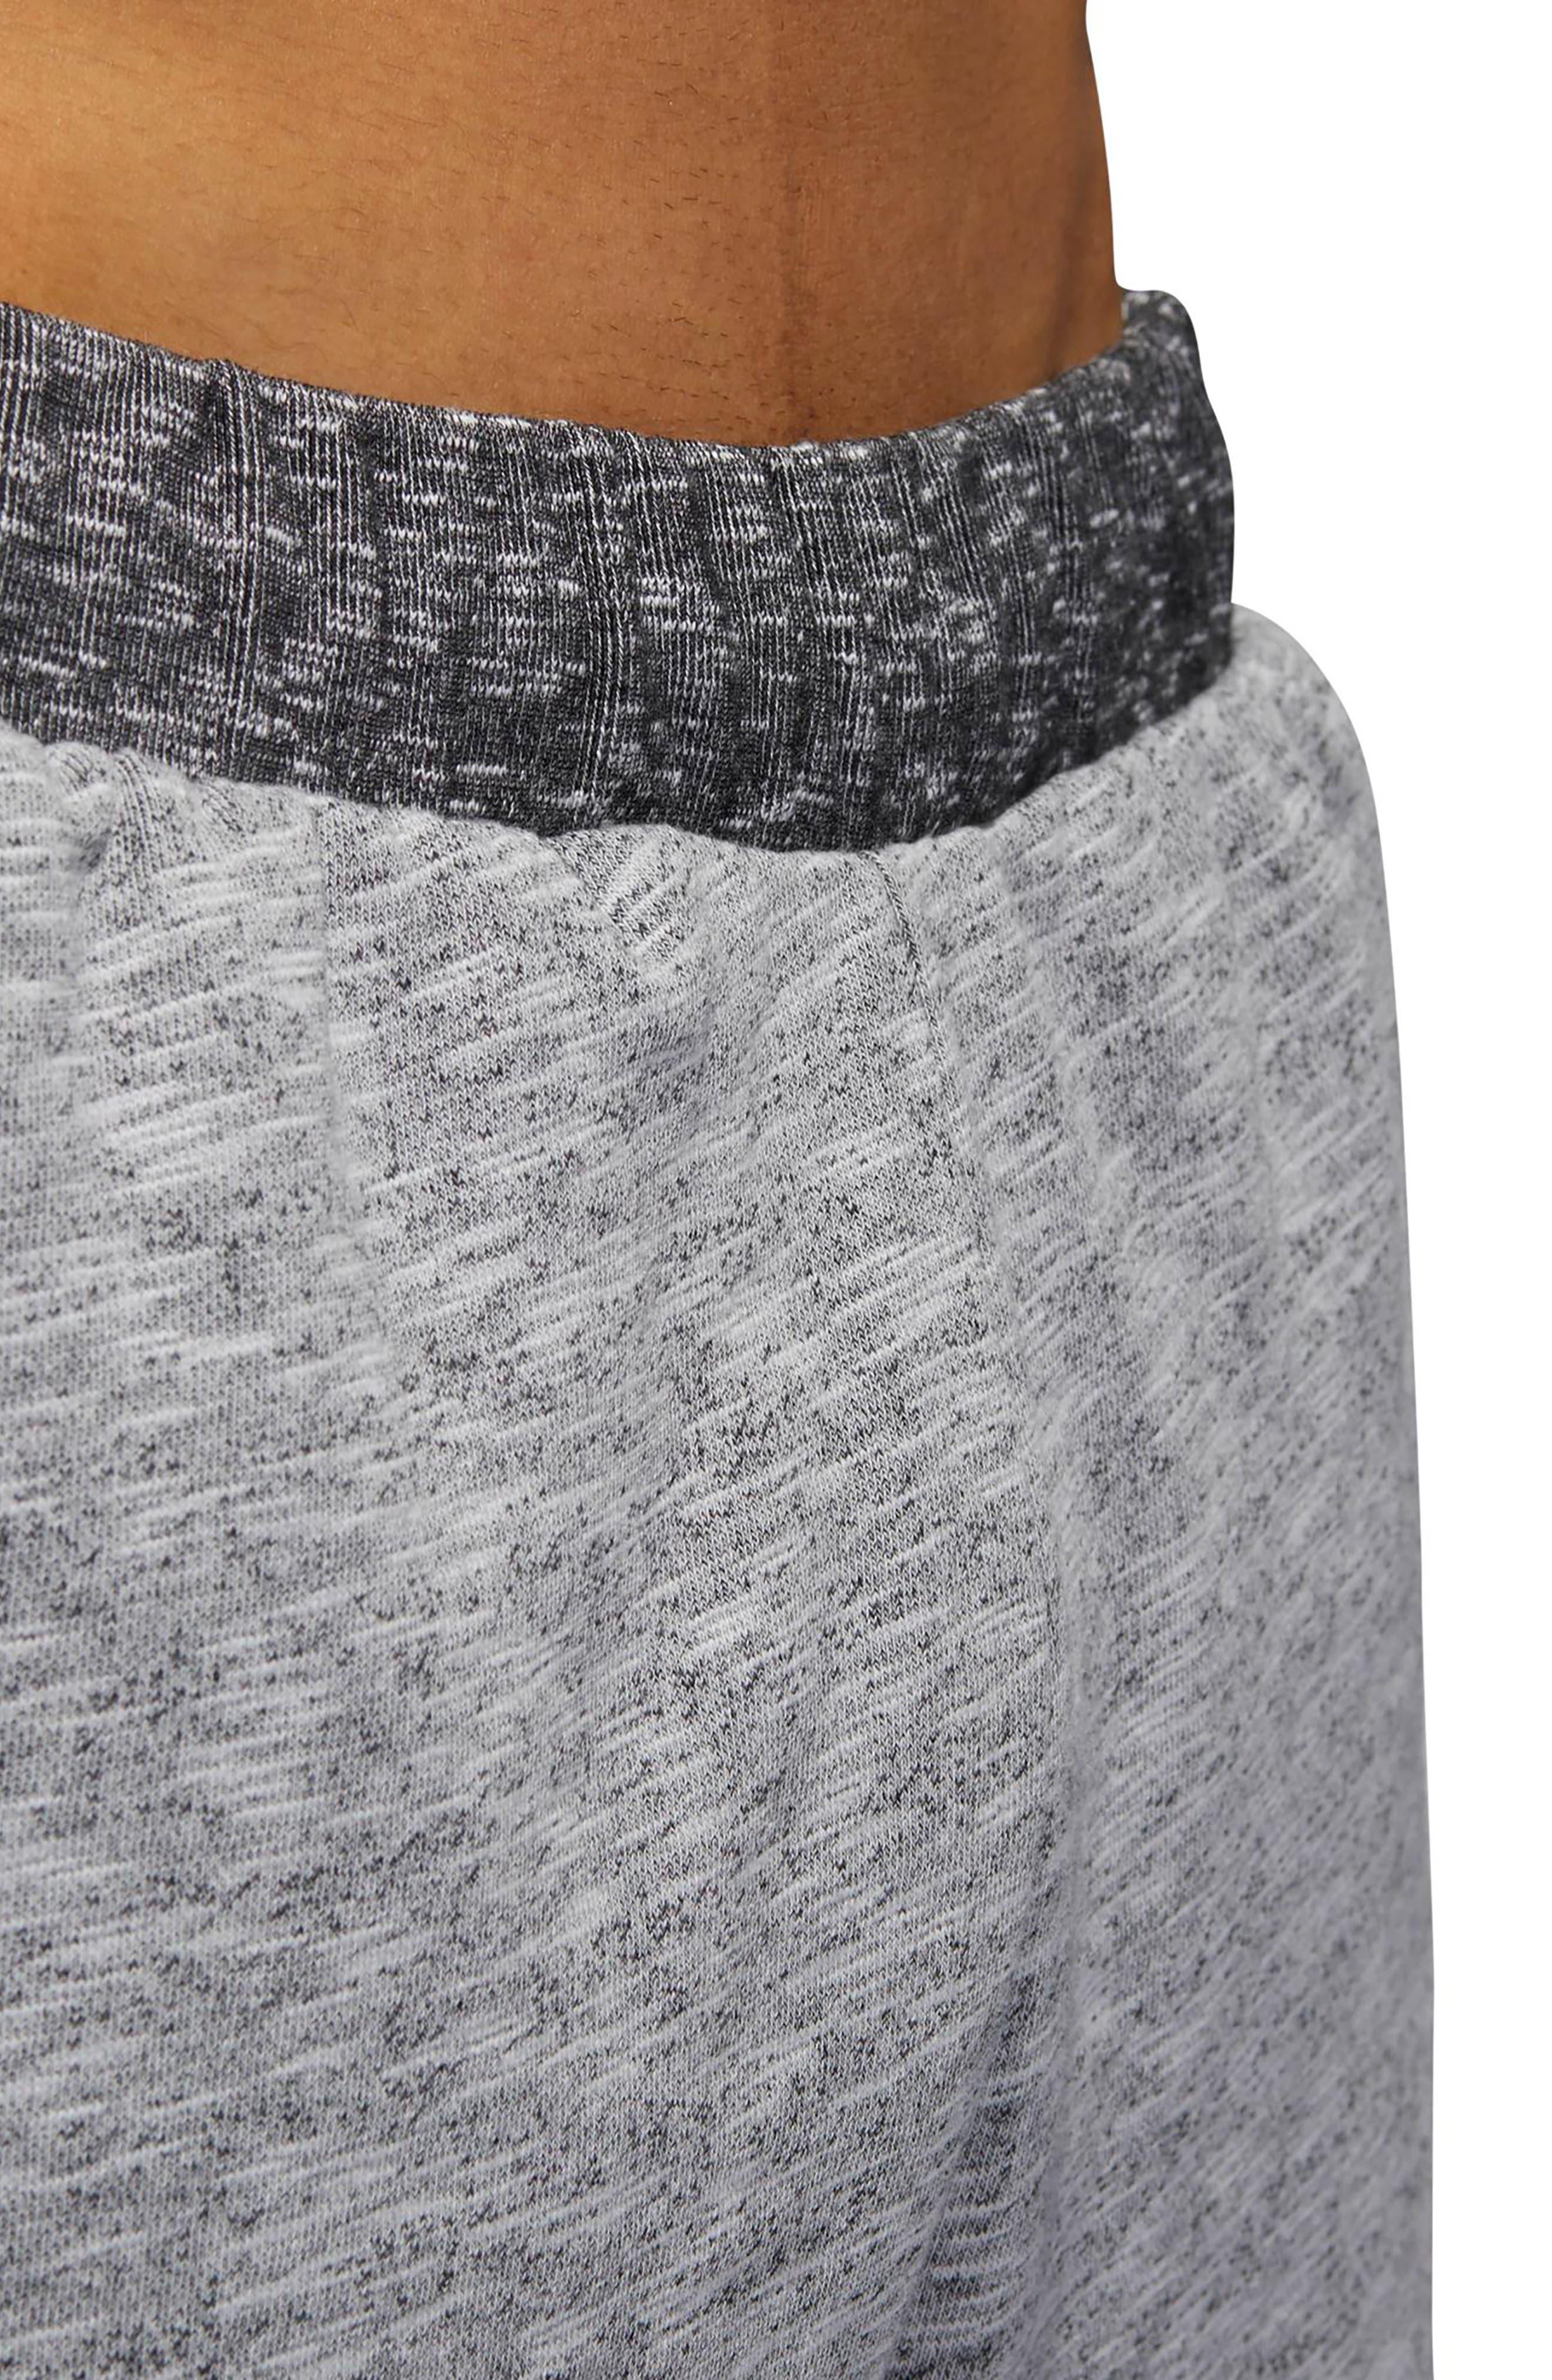 Pick Up Knit Shorts,                             Alternate thumbnail 6, color,                             Lgh Solid Grey